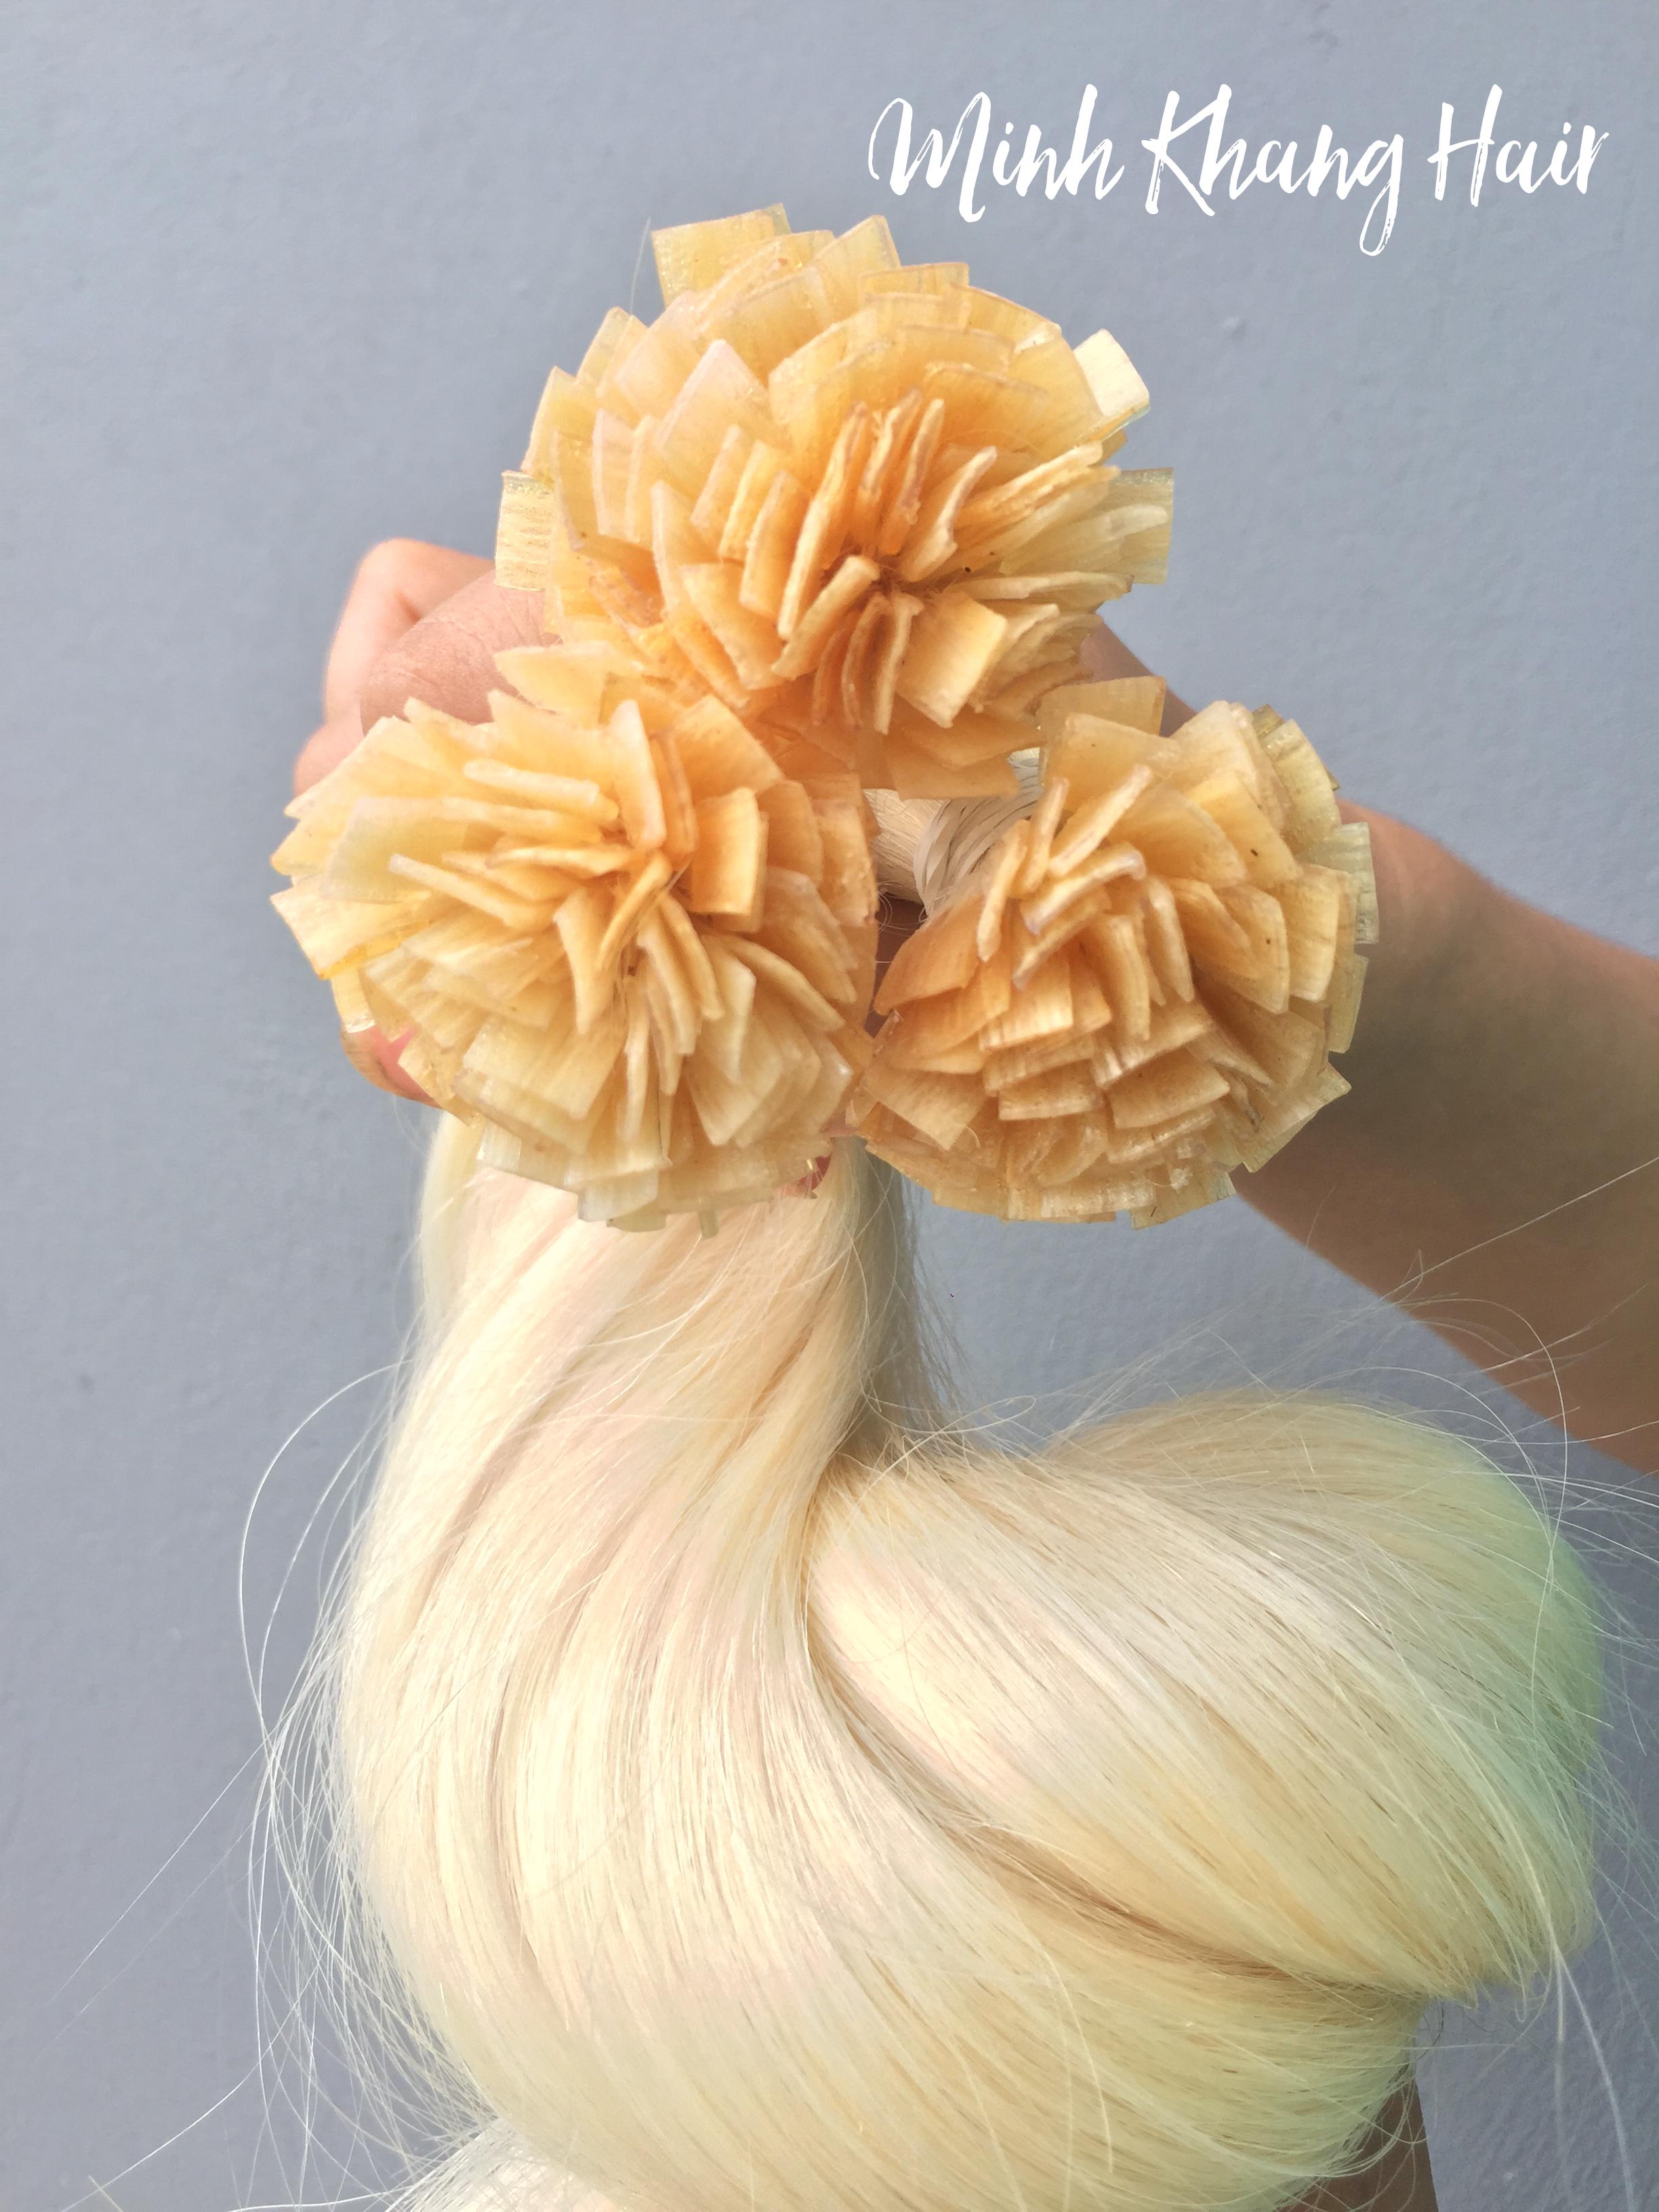 Ghim của Minh Khang Hair trên Keratin hair